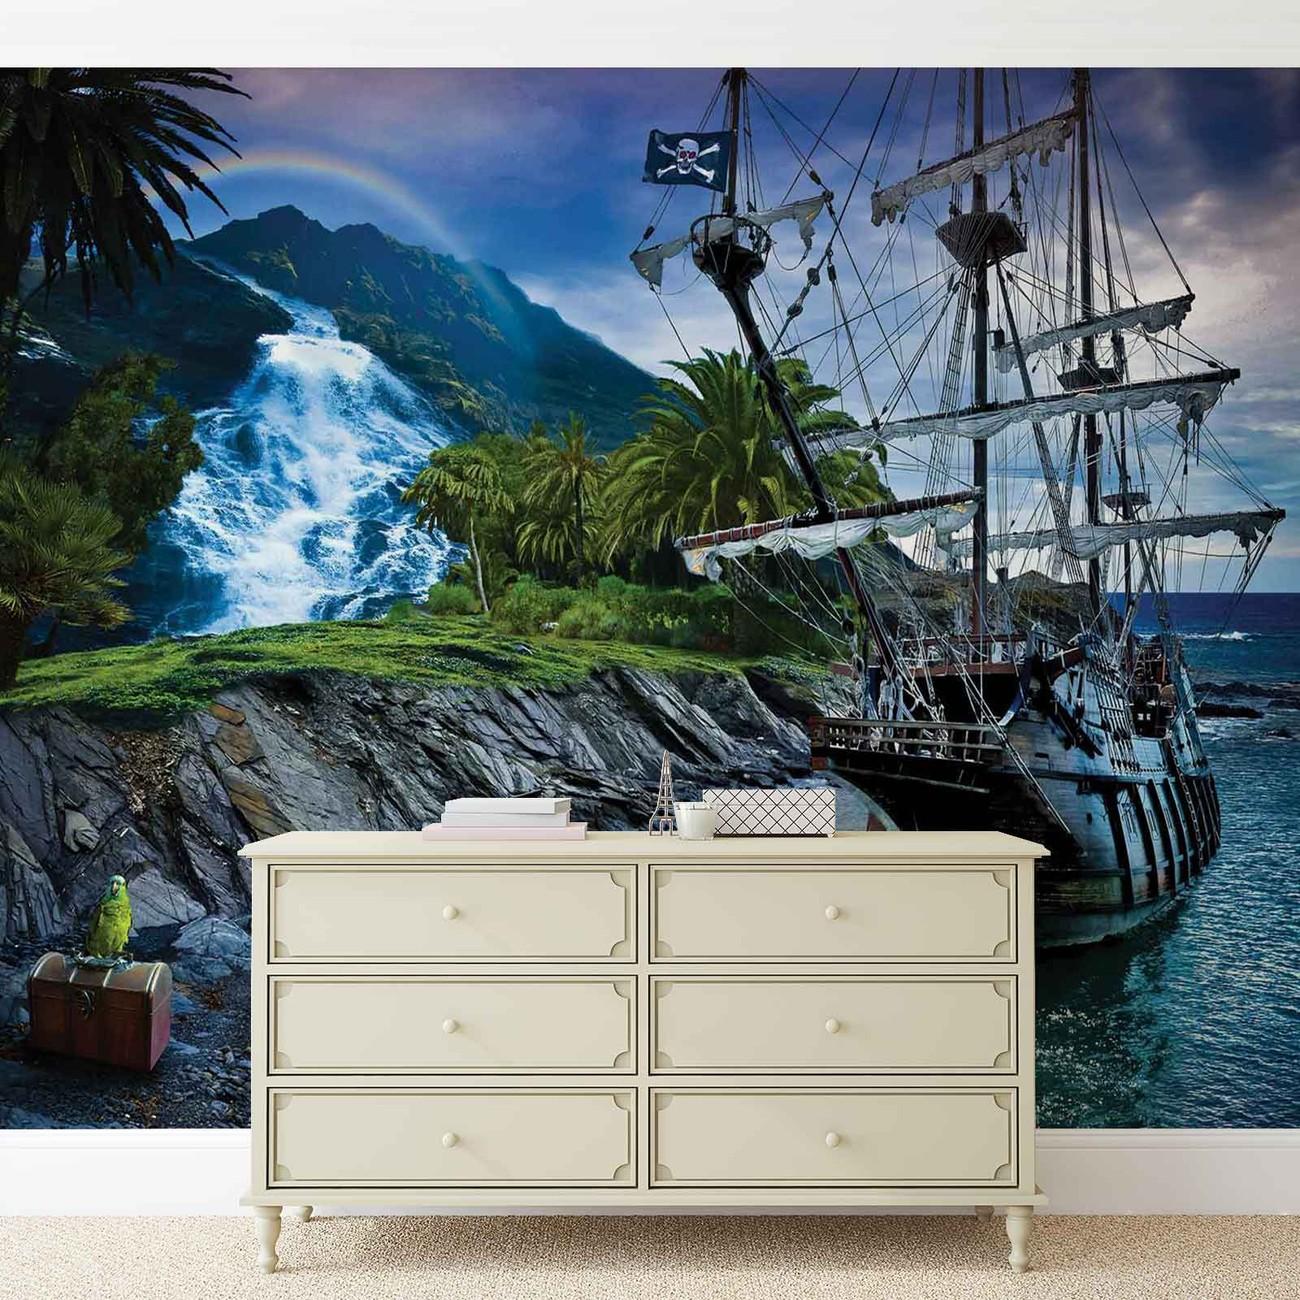 fototapete tapete meer schiff palmen wasserfall wald. Black Bedroom Furniture Sets. Home Design Ideas